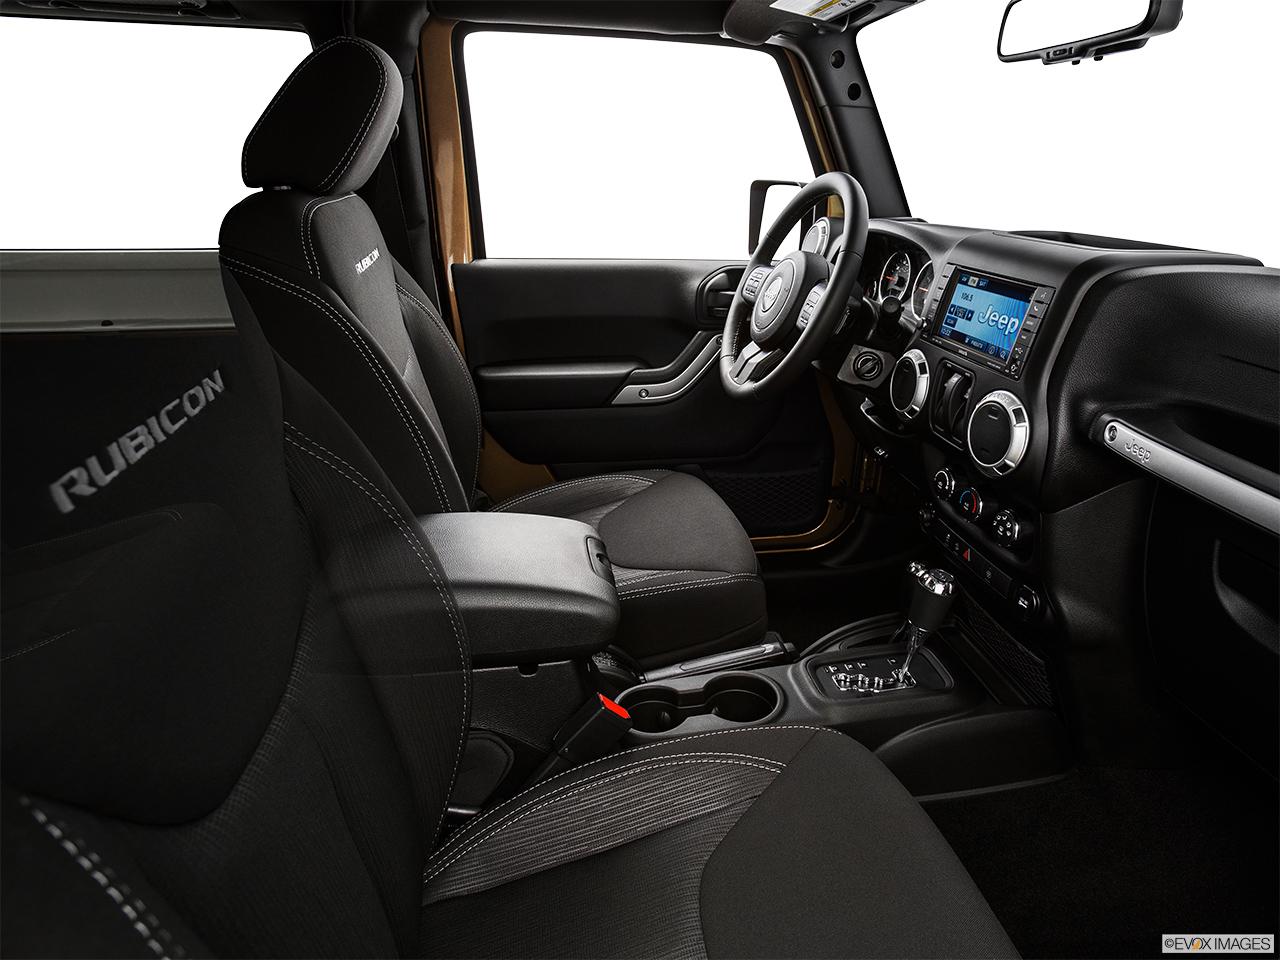 Black Jeep Wrangler 2 Door Interior Images Galleries With A Bite